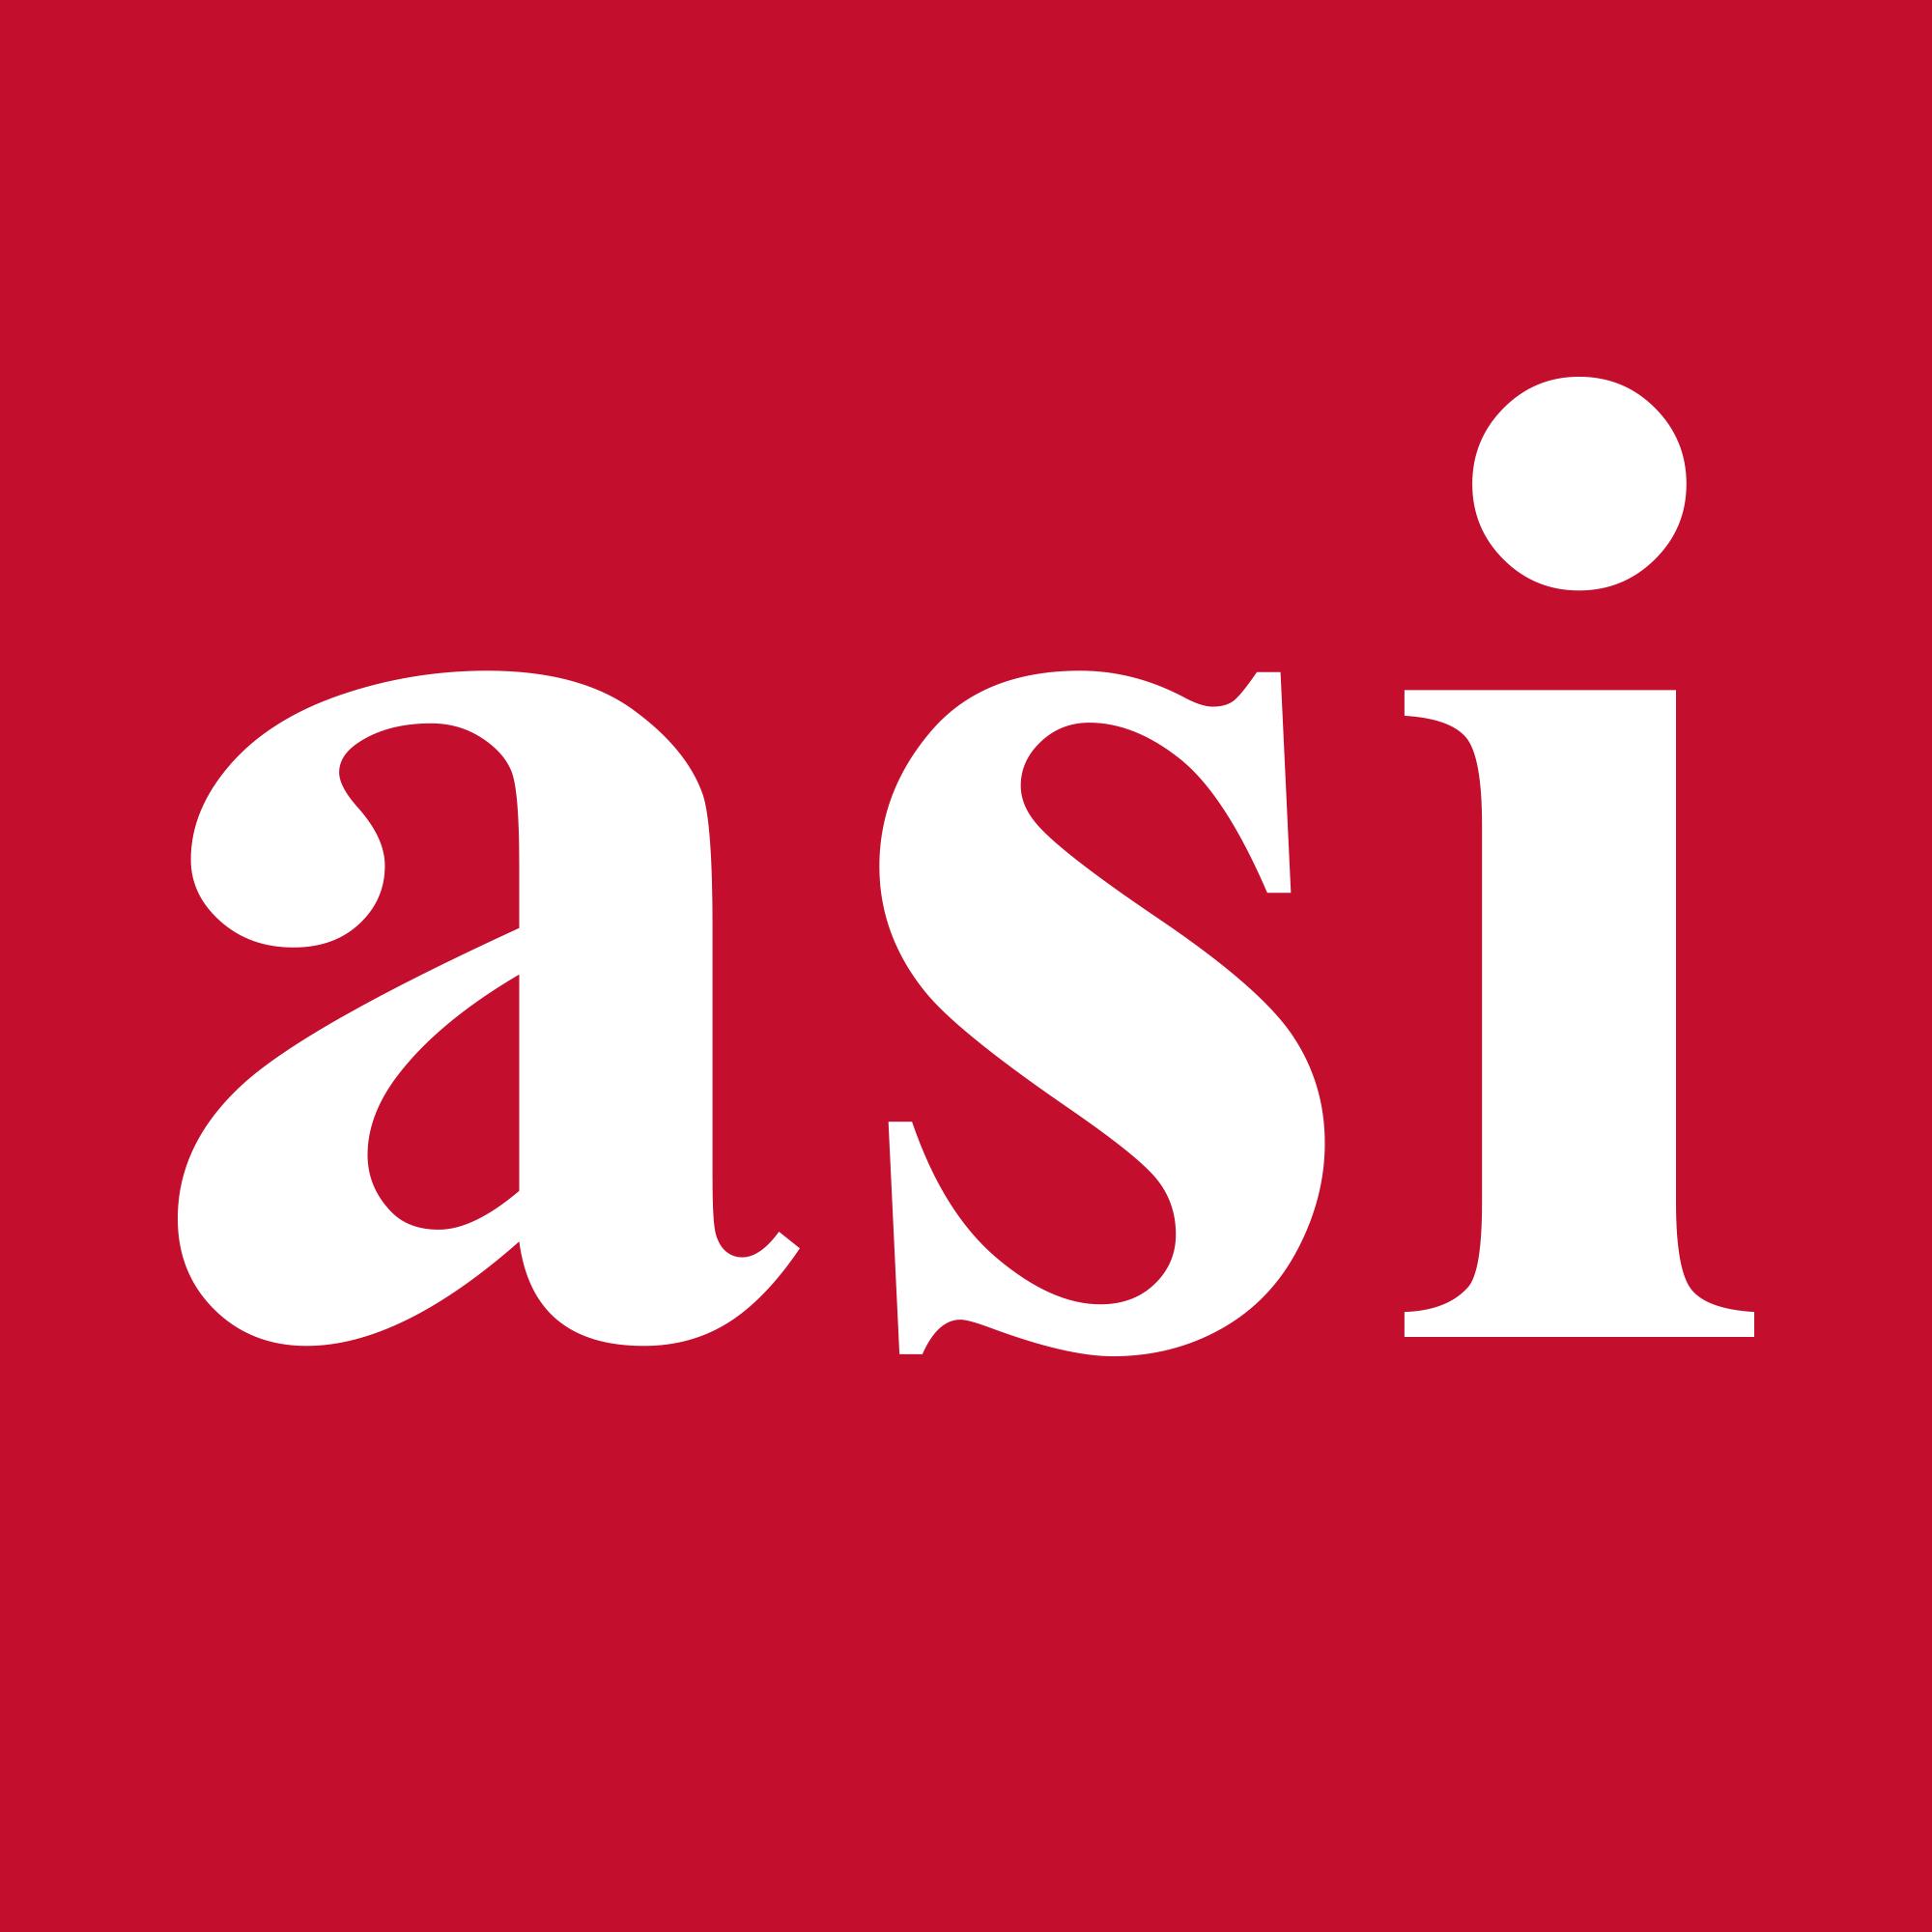 asiCast